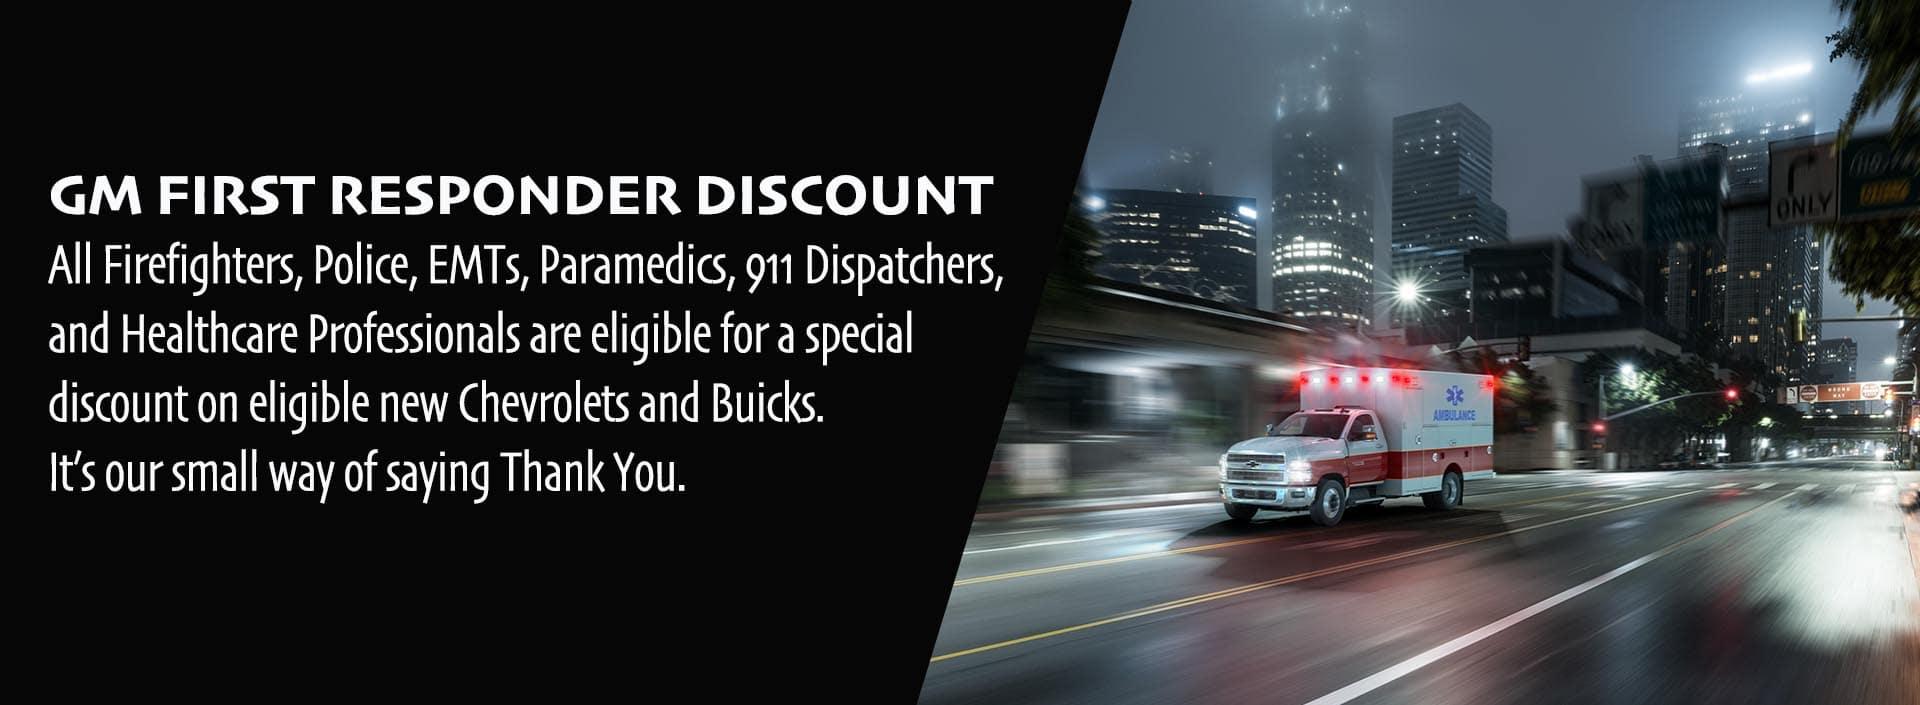 GM First Responder Discount